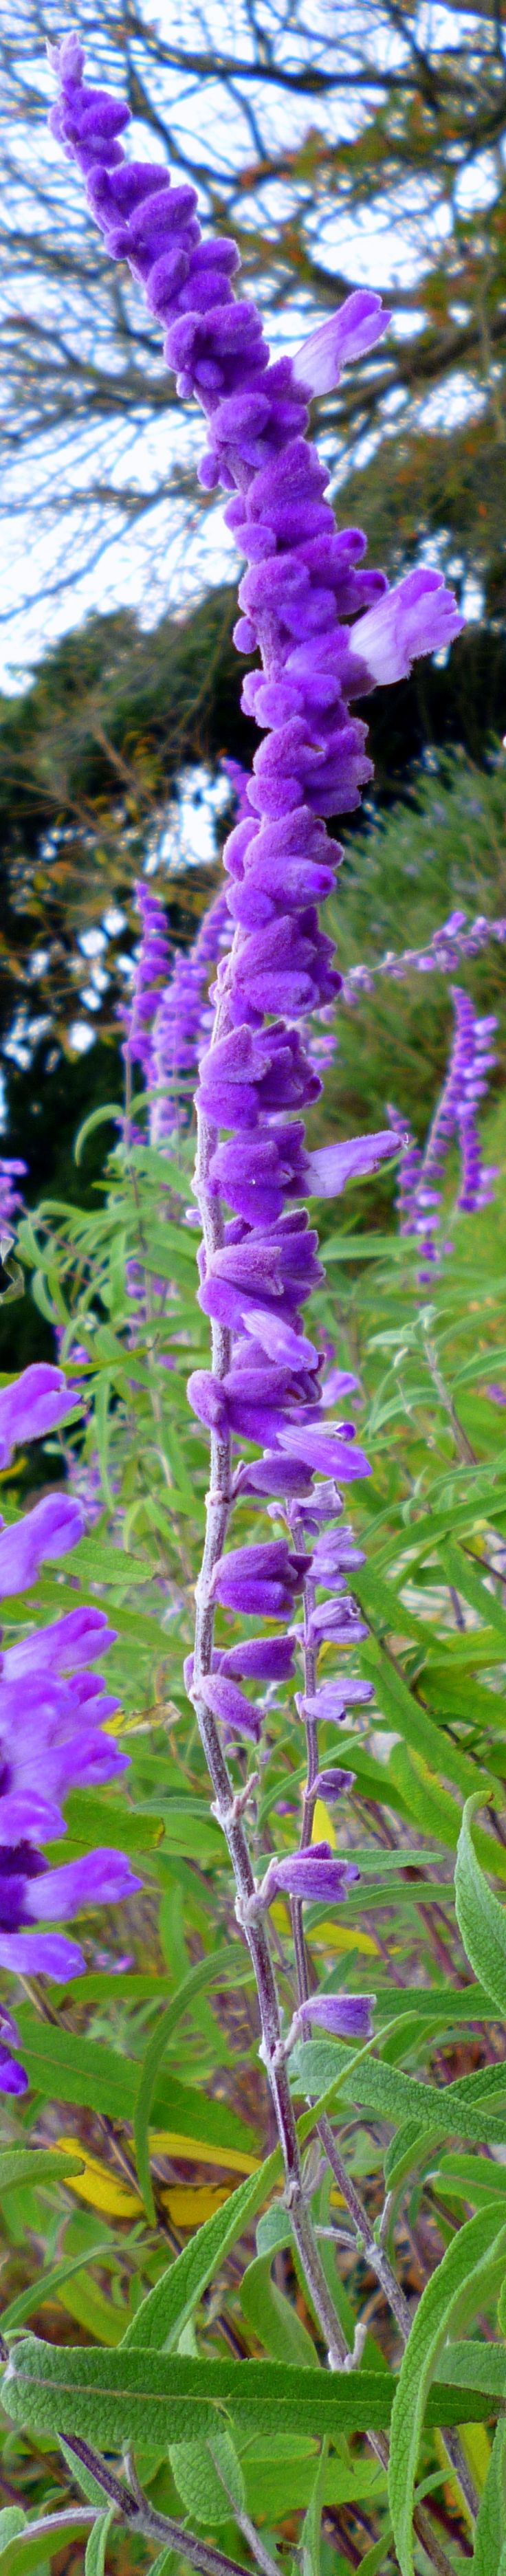 best 25+ plants with purple flowers ideas on pinterest | trees